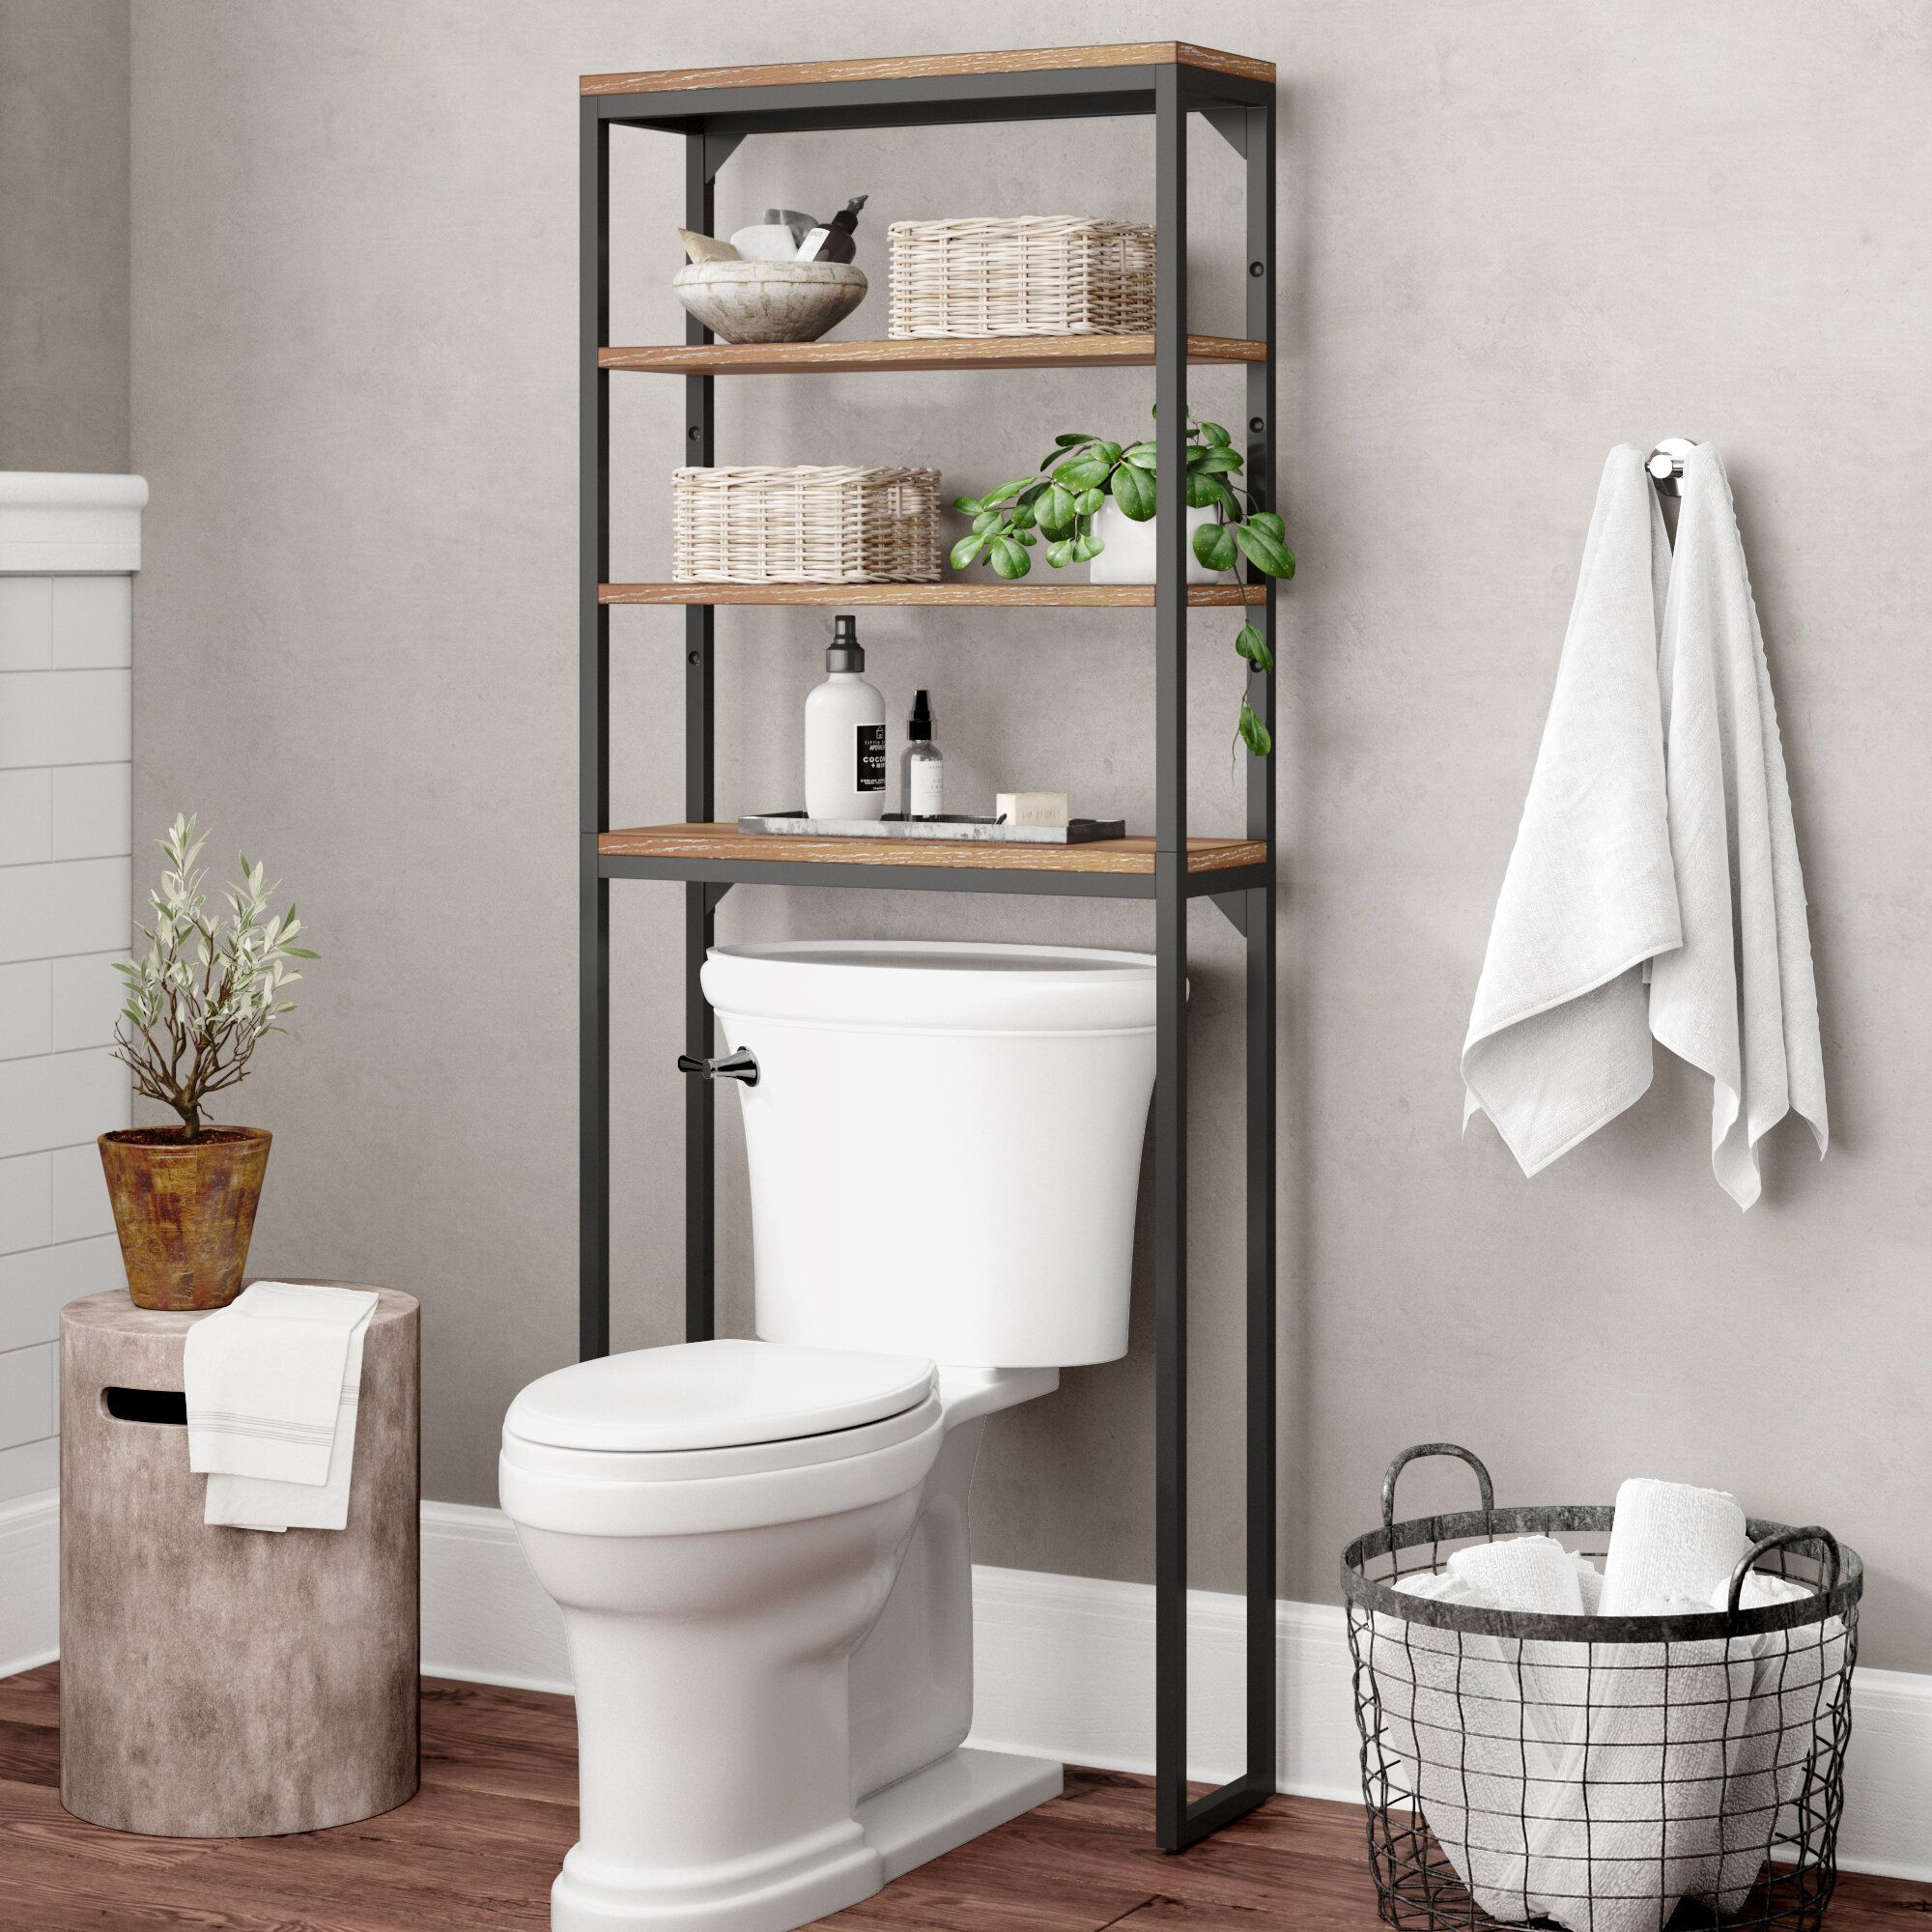 26 Contemporary Bathroom Storage Over Toilet Ceplukan Toilet Storage Small Bathroom Decor Toilet Shelves